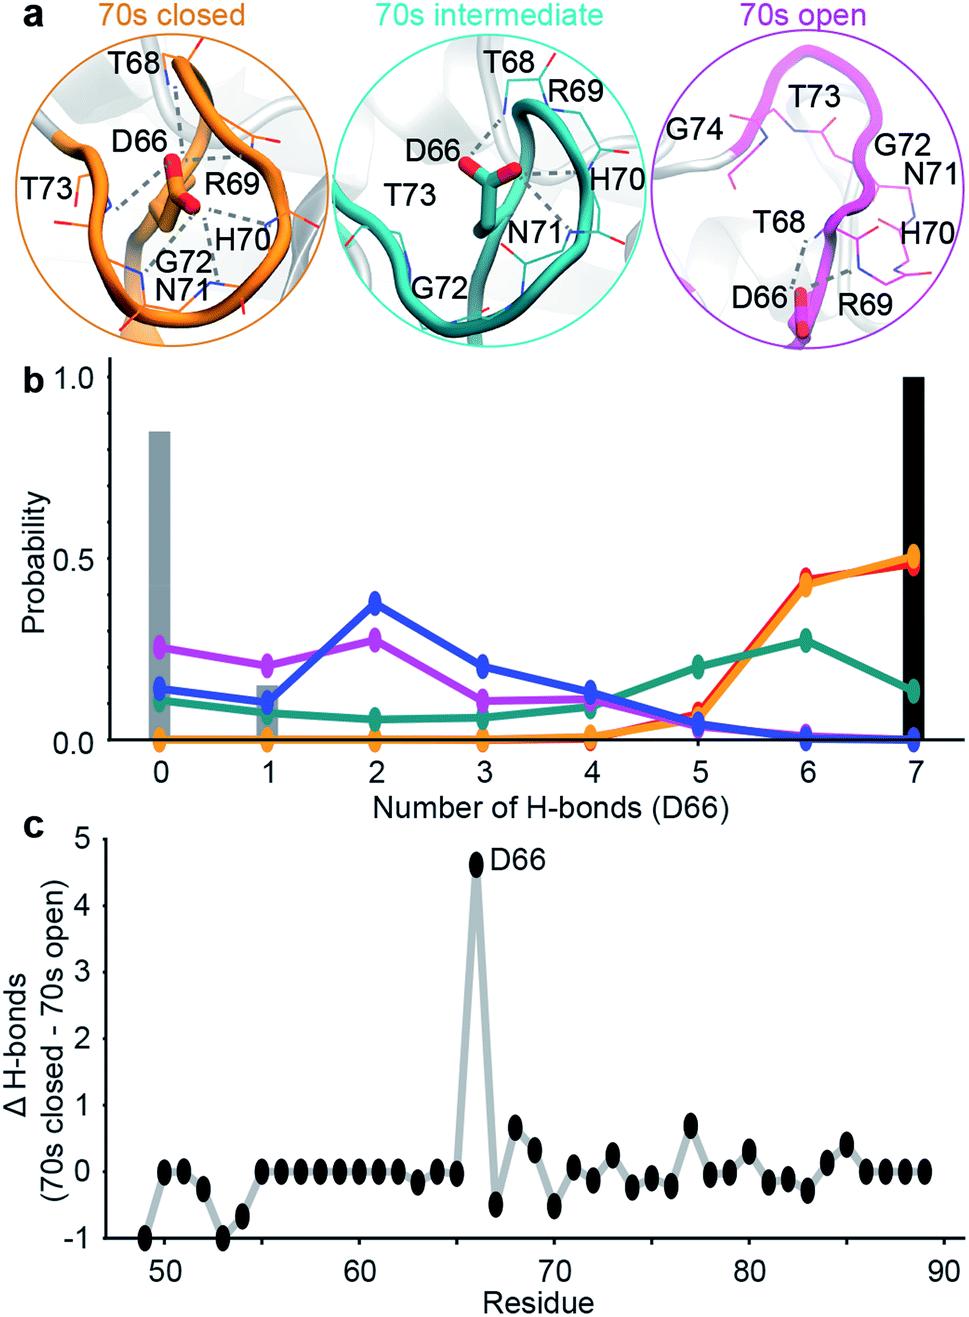 Chem. Sci | 加速动力学结合马尔可夫模型指导蛋白设计